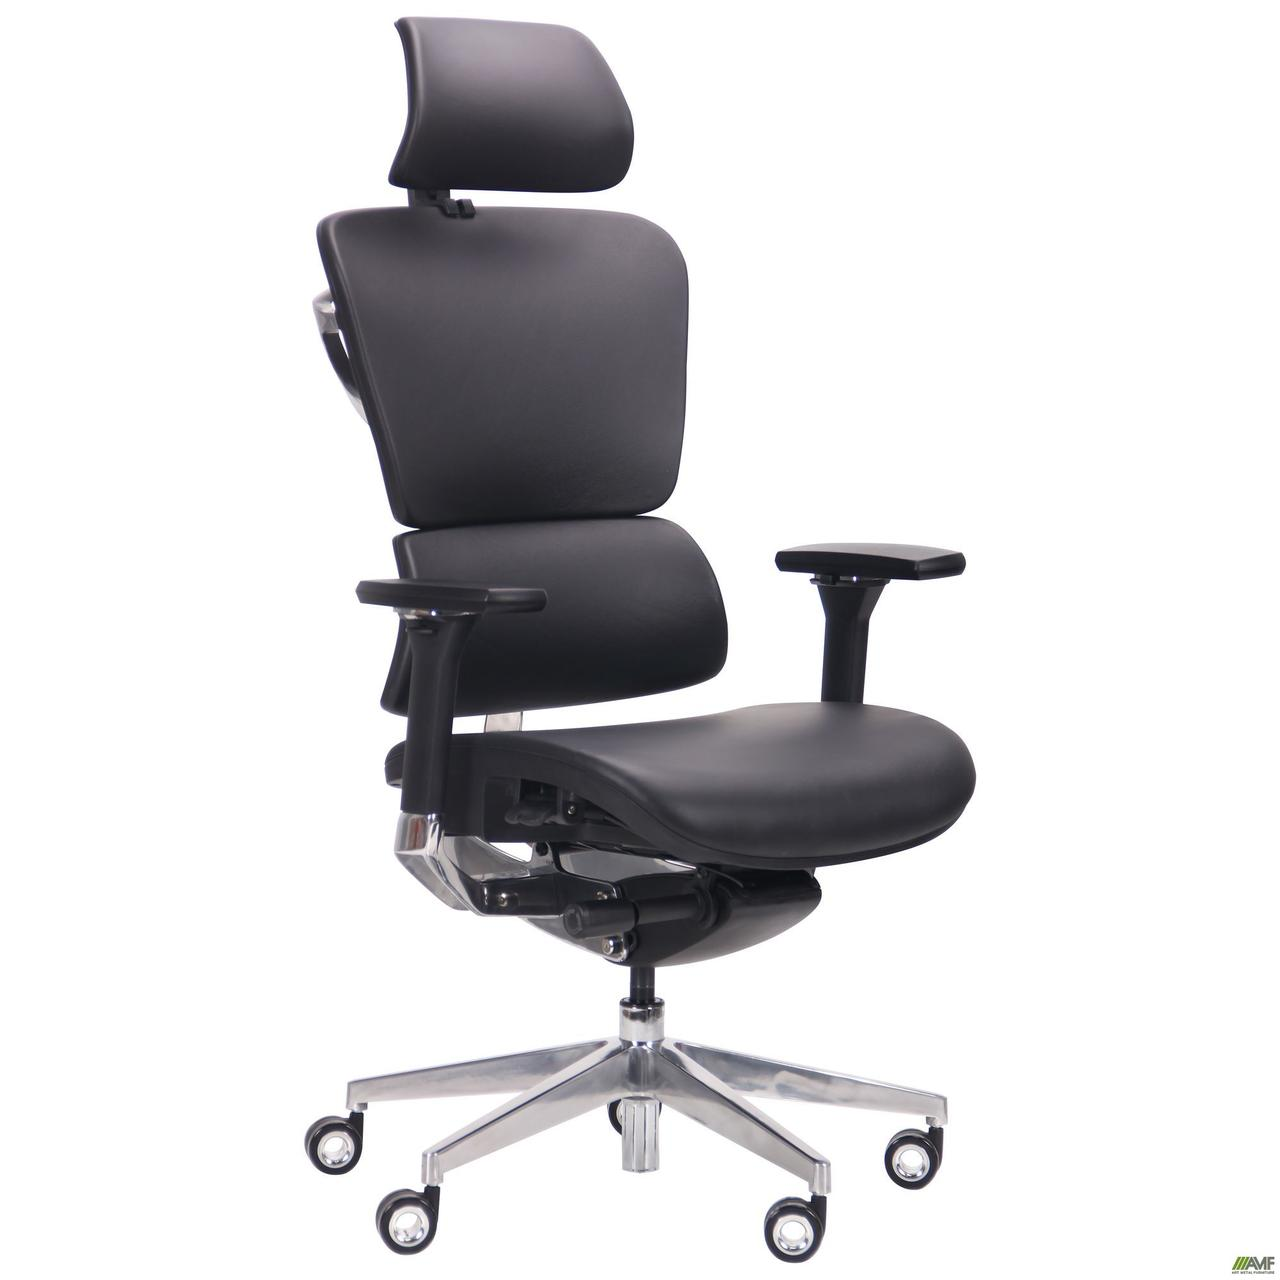 Кресло Crystal PRO Alum, Black leather TM AMF